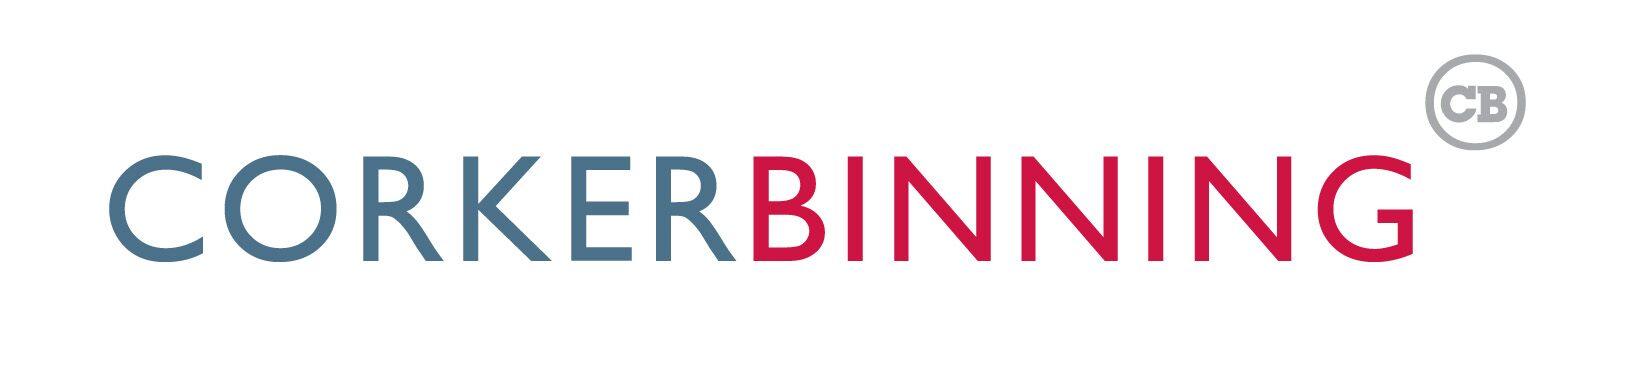 Corker Binning